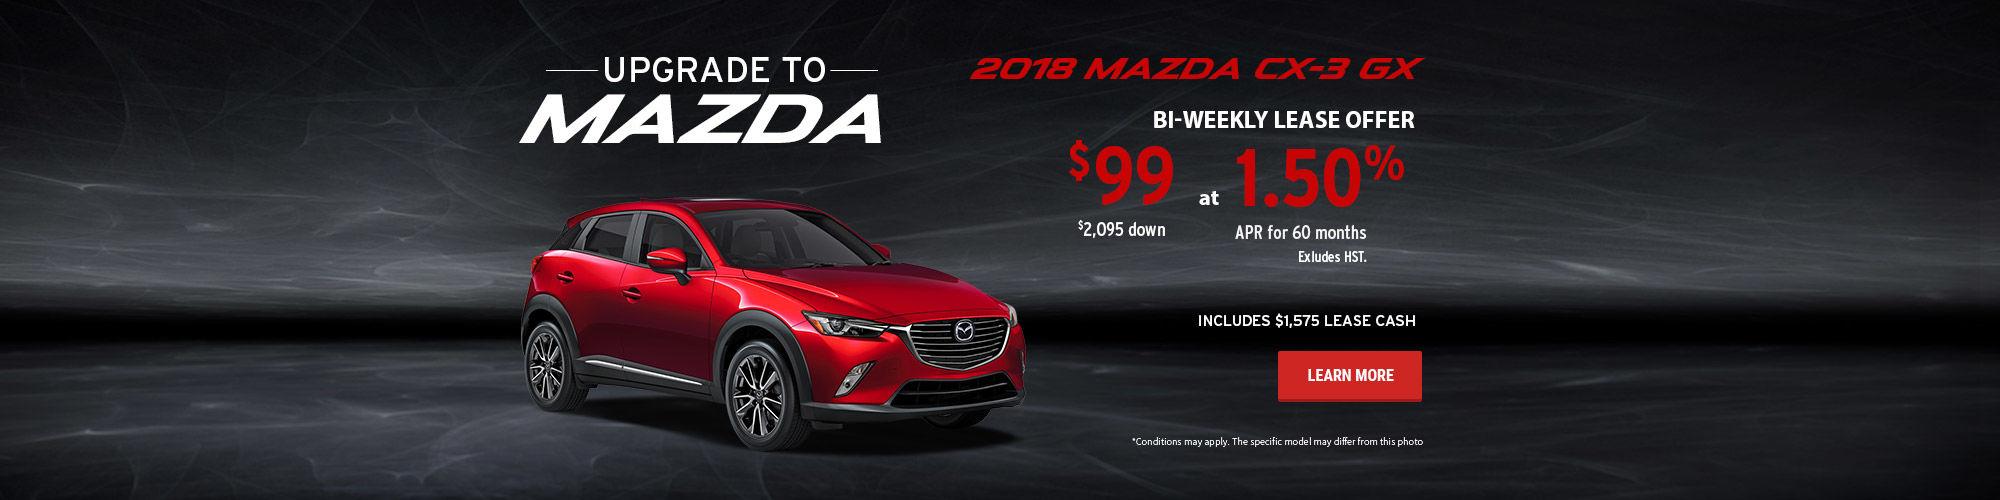 Upgrade to Mazda - CX-3